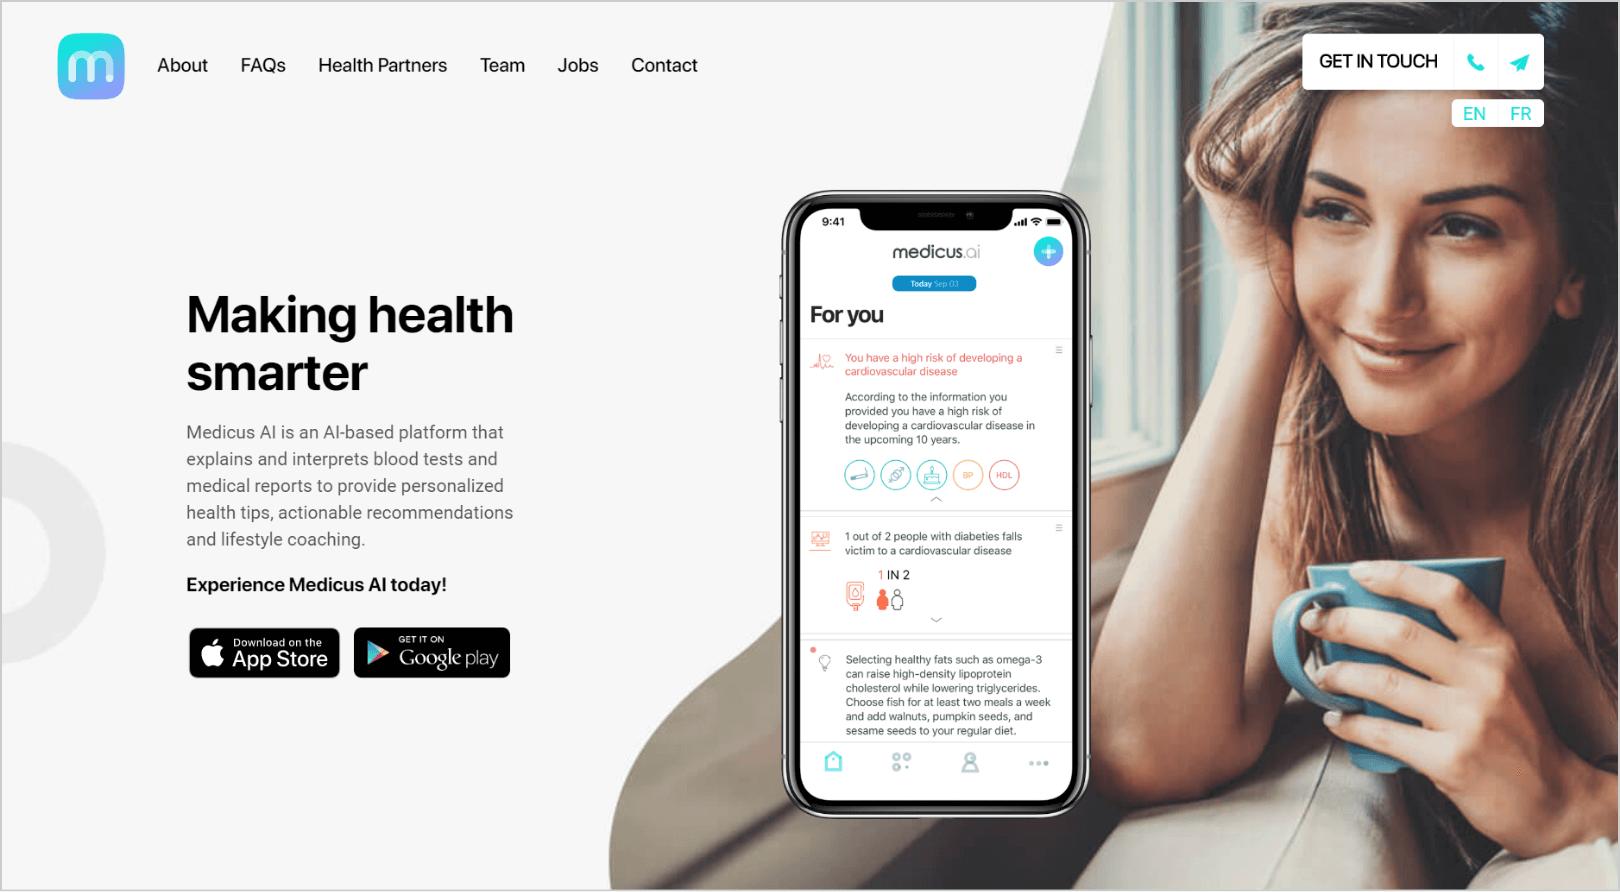 Medicus AI health platform and app startup